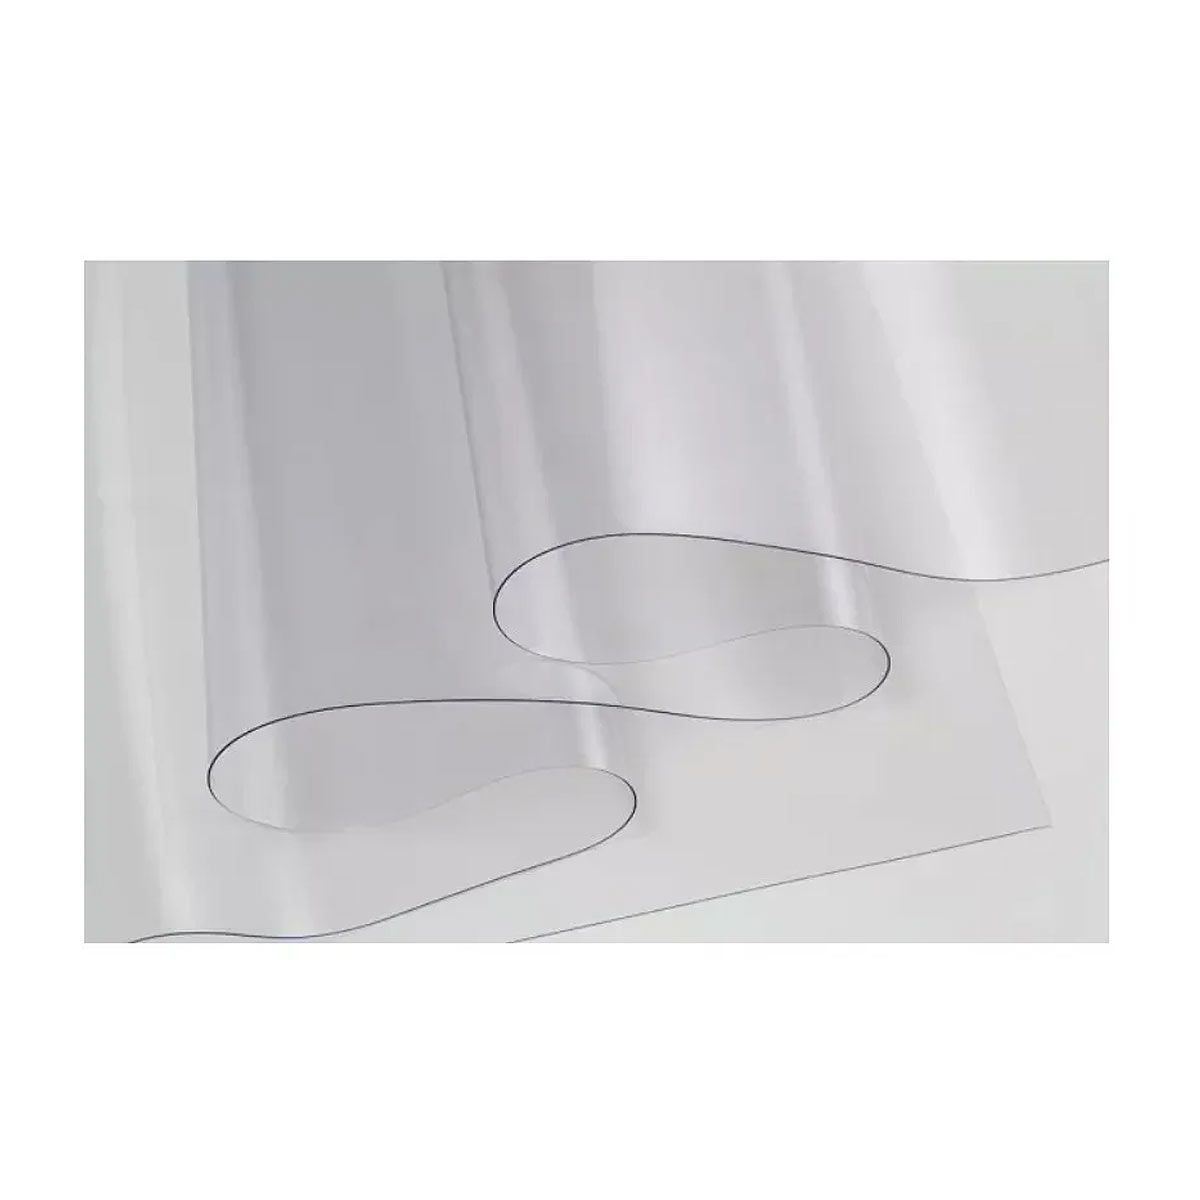 2 Metros Plástico Transparente Pvc Cristal 0,15mm